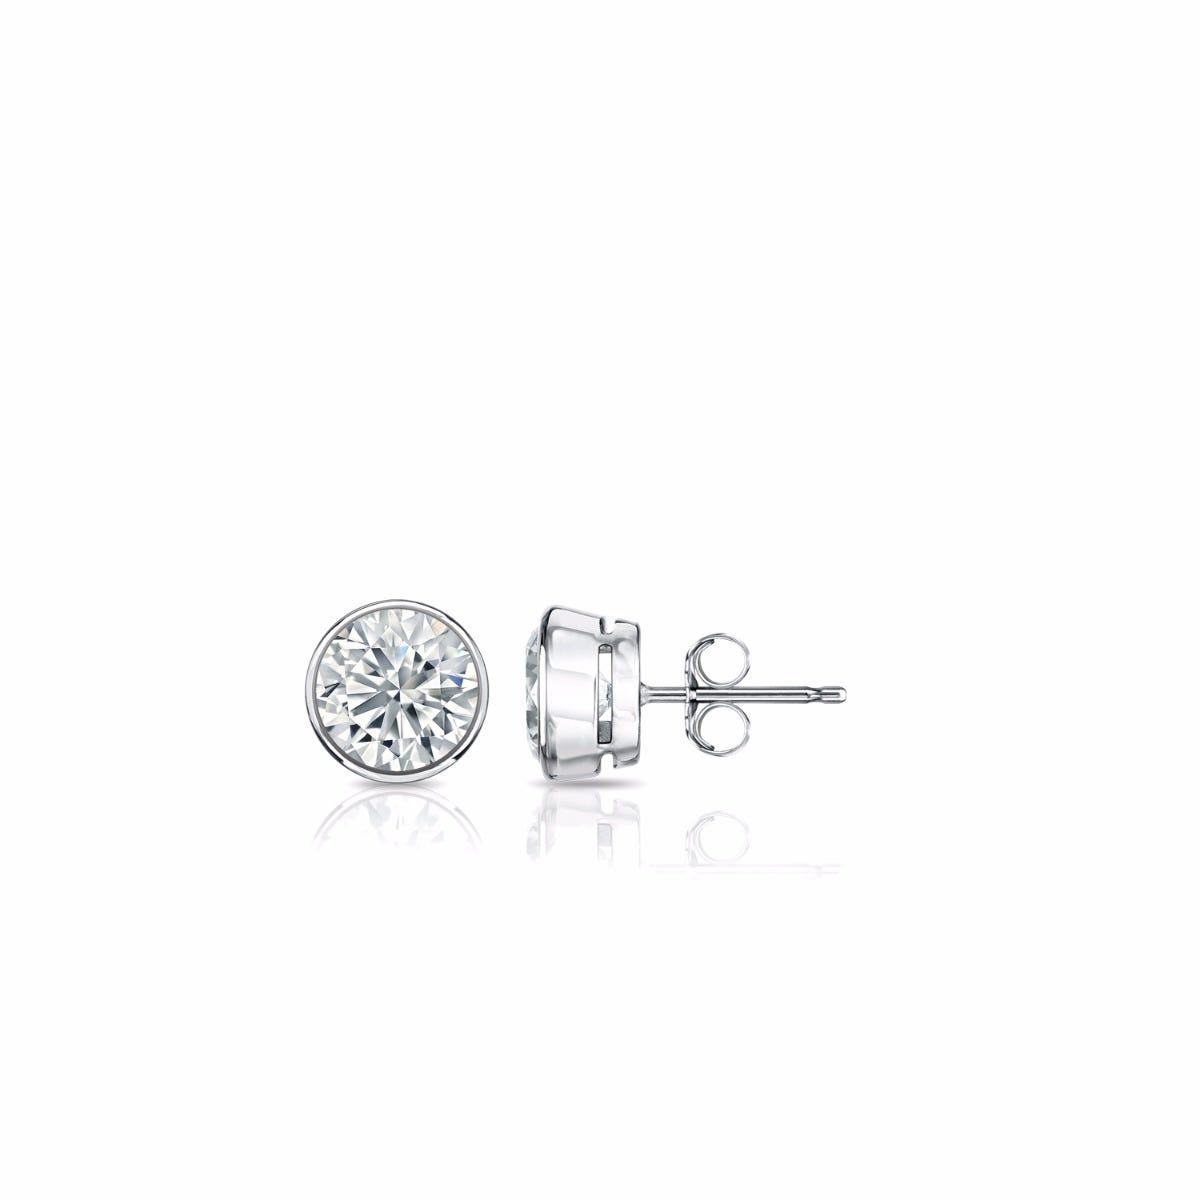 Bezel-Set Round 1/6ctw. Diamond Solitaire Stud Earrings (IJ, SI2) in 18K White Gold